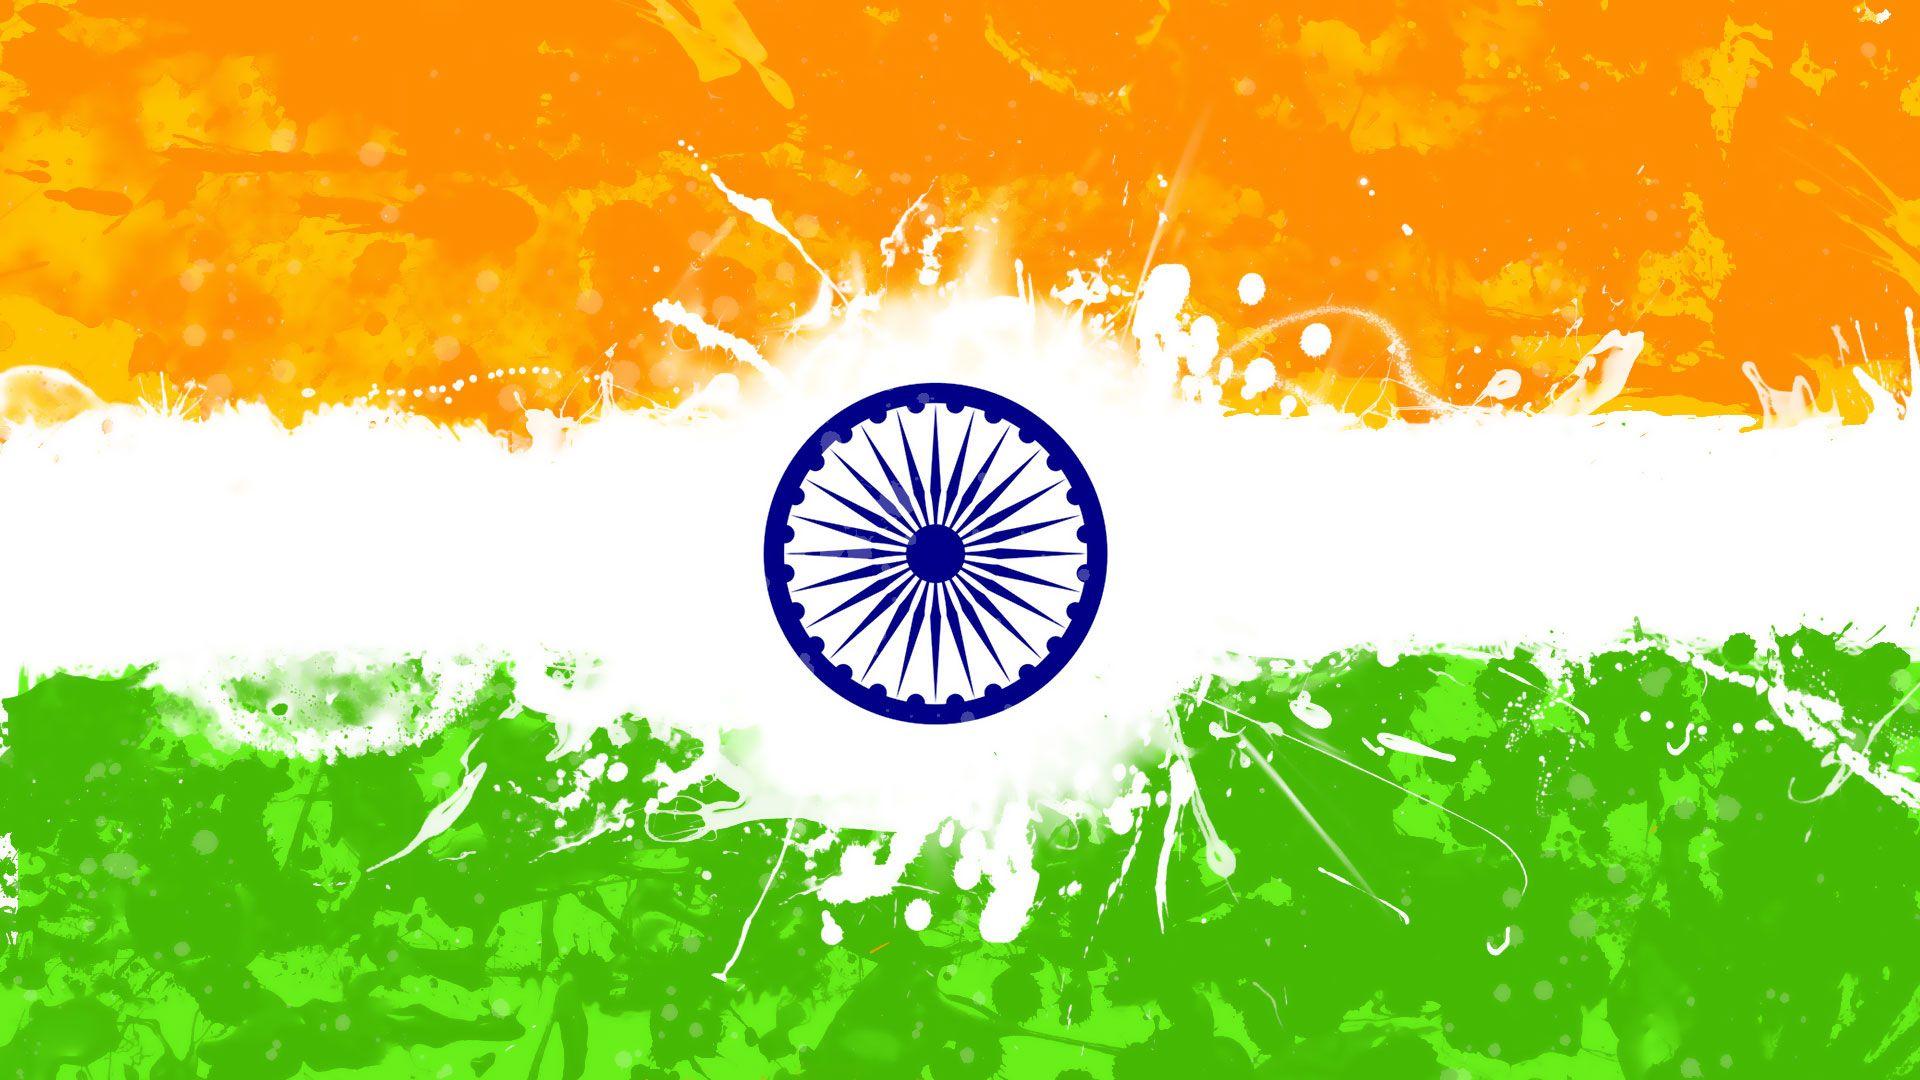 Indian Flag Wallpaper: Indian Flag Wallpapers Images